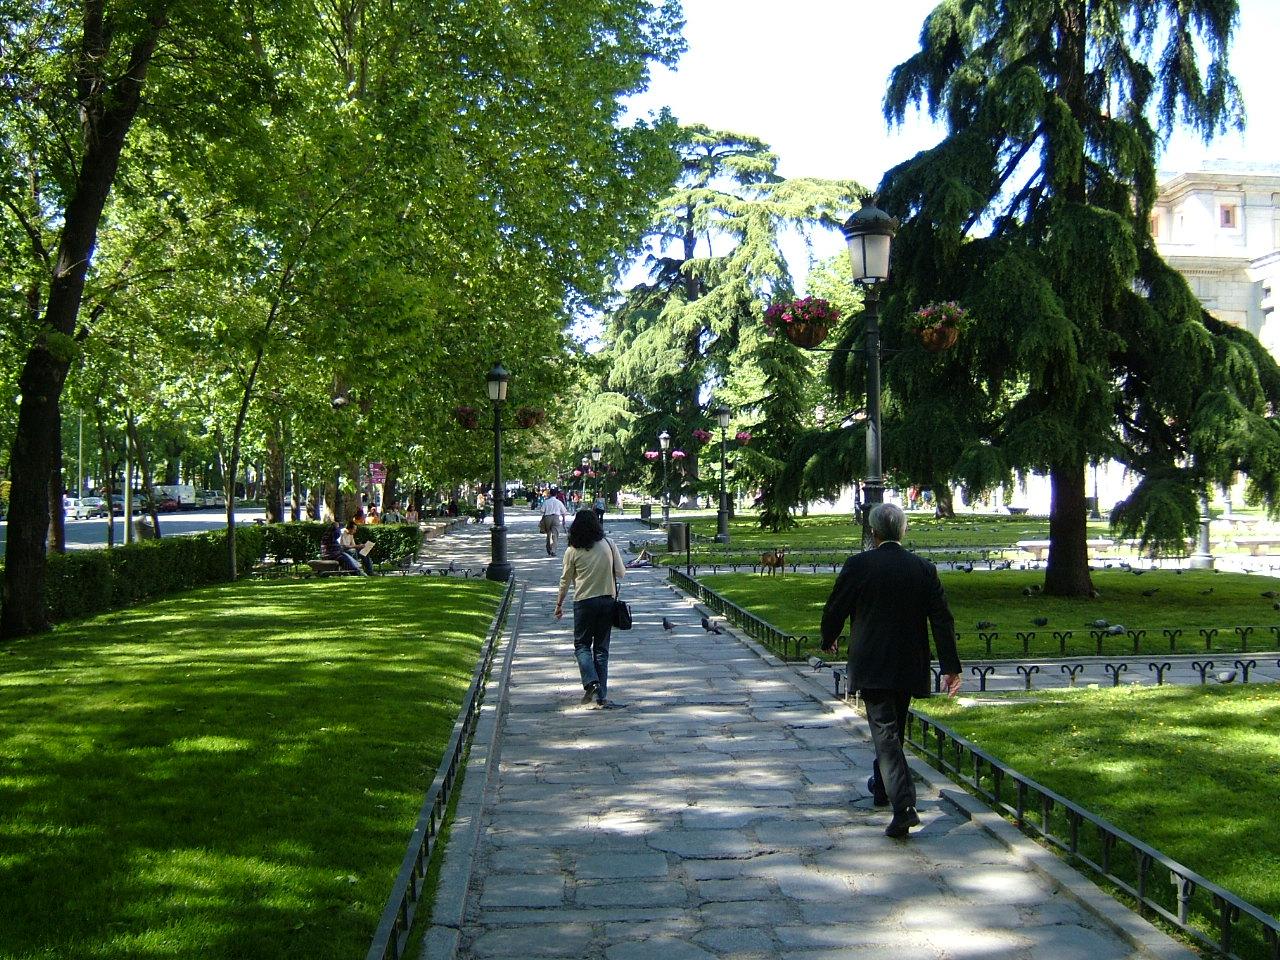 Bestand paseo del prado madrid wikipedia for Calle del prado 9 madrid espana